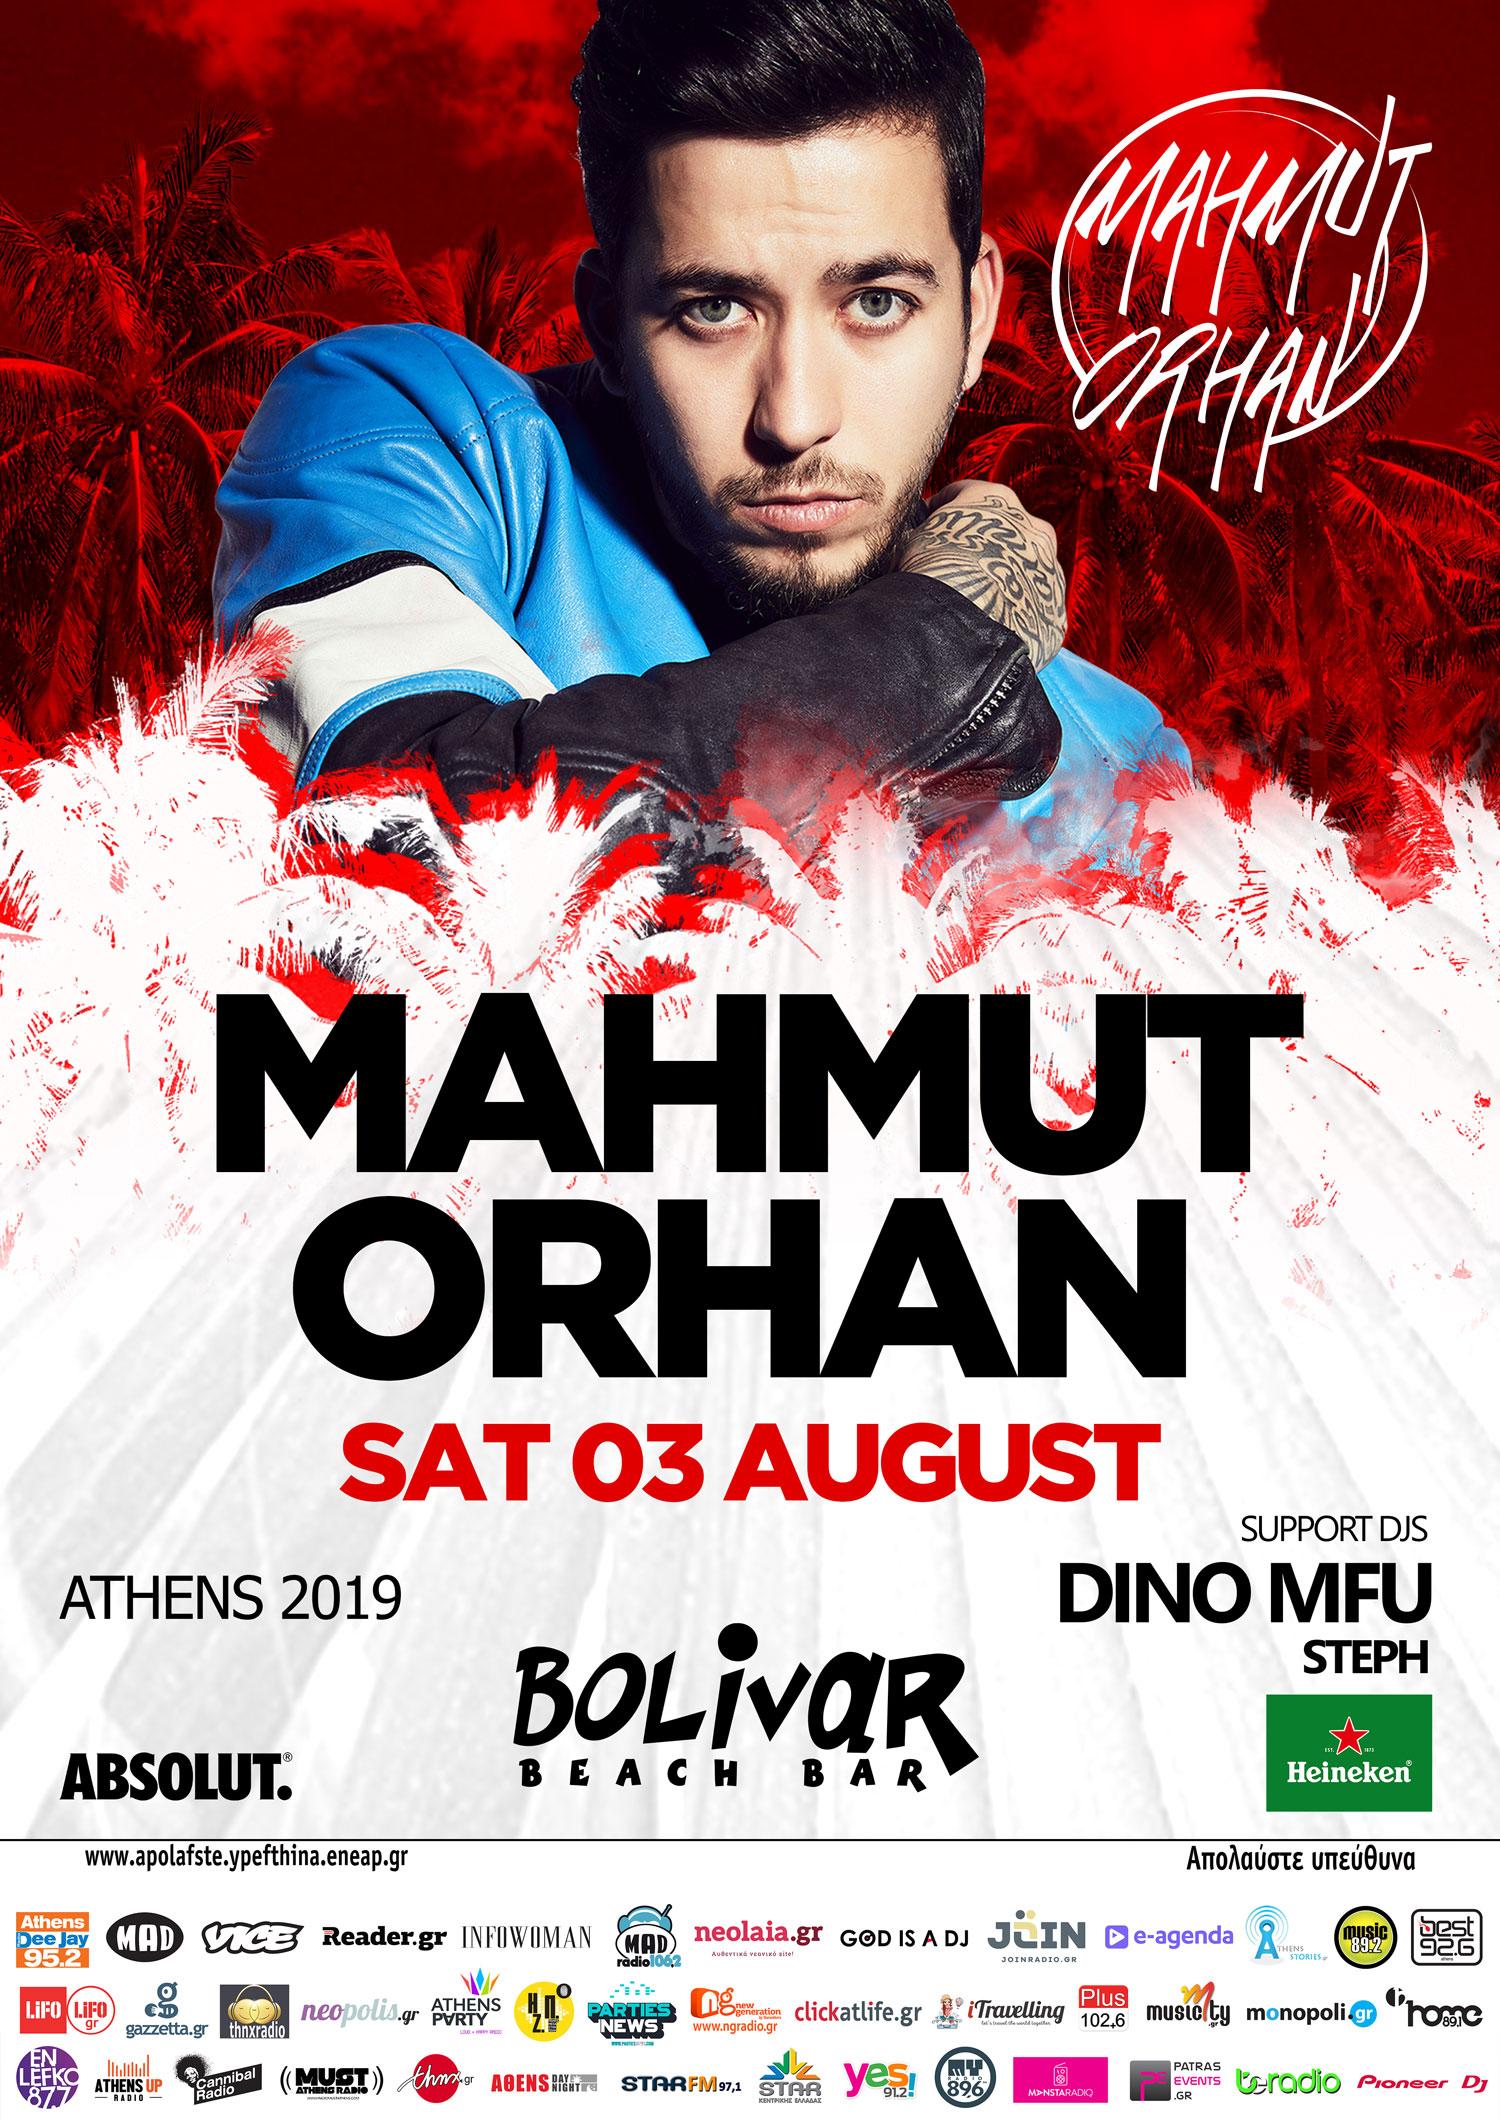 Mahmut Orhan - Poster